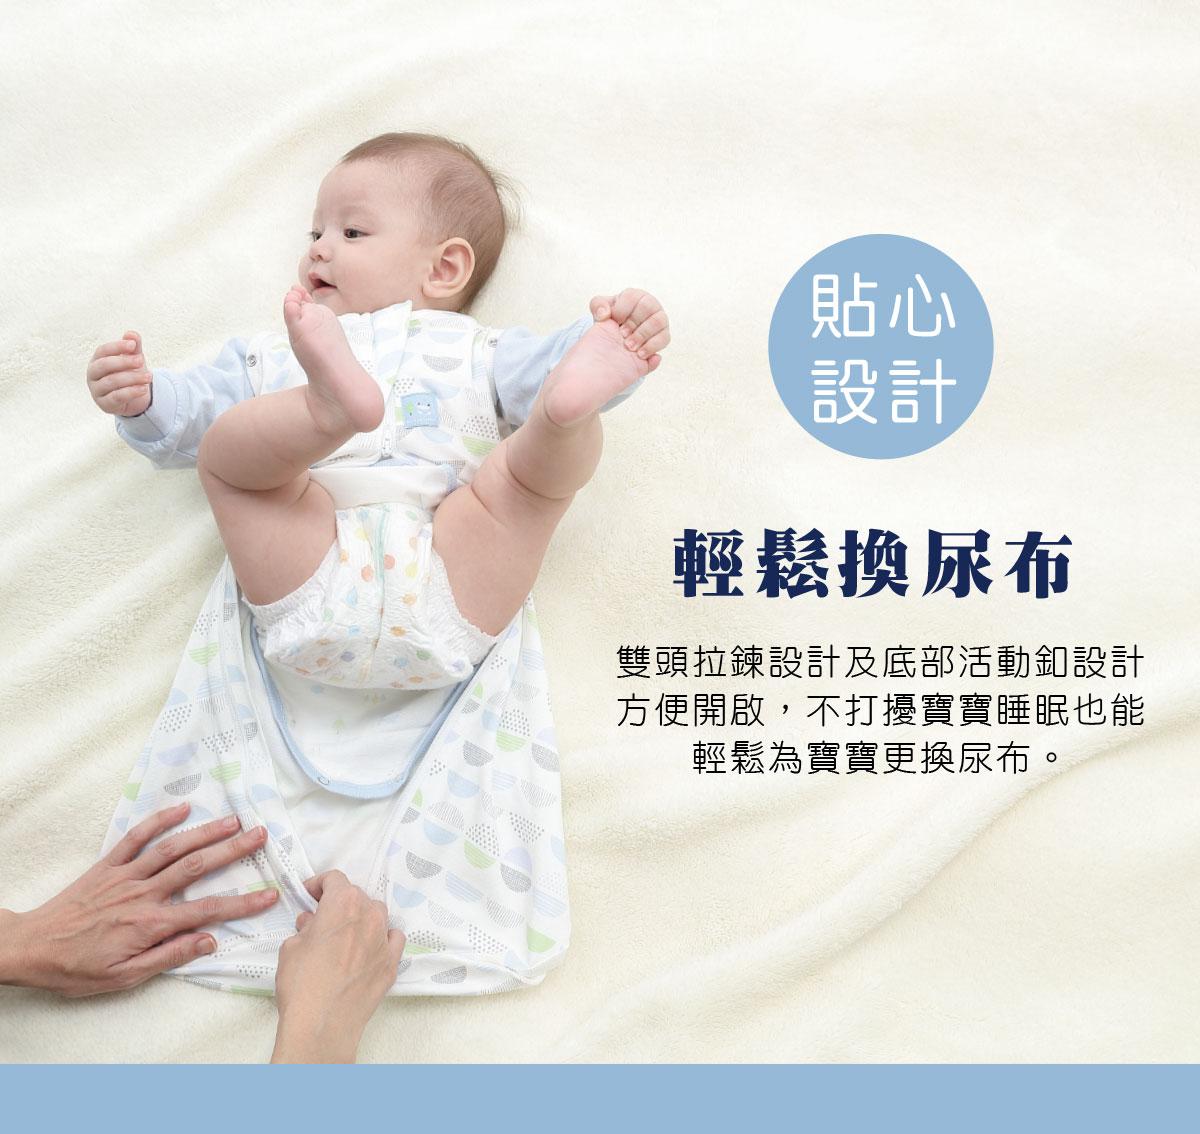 proimages/BeddingSeries/Blankets-Comforter/2539/2539-成長包巾EDM-9.jpg